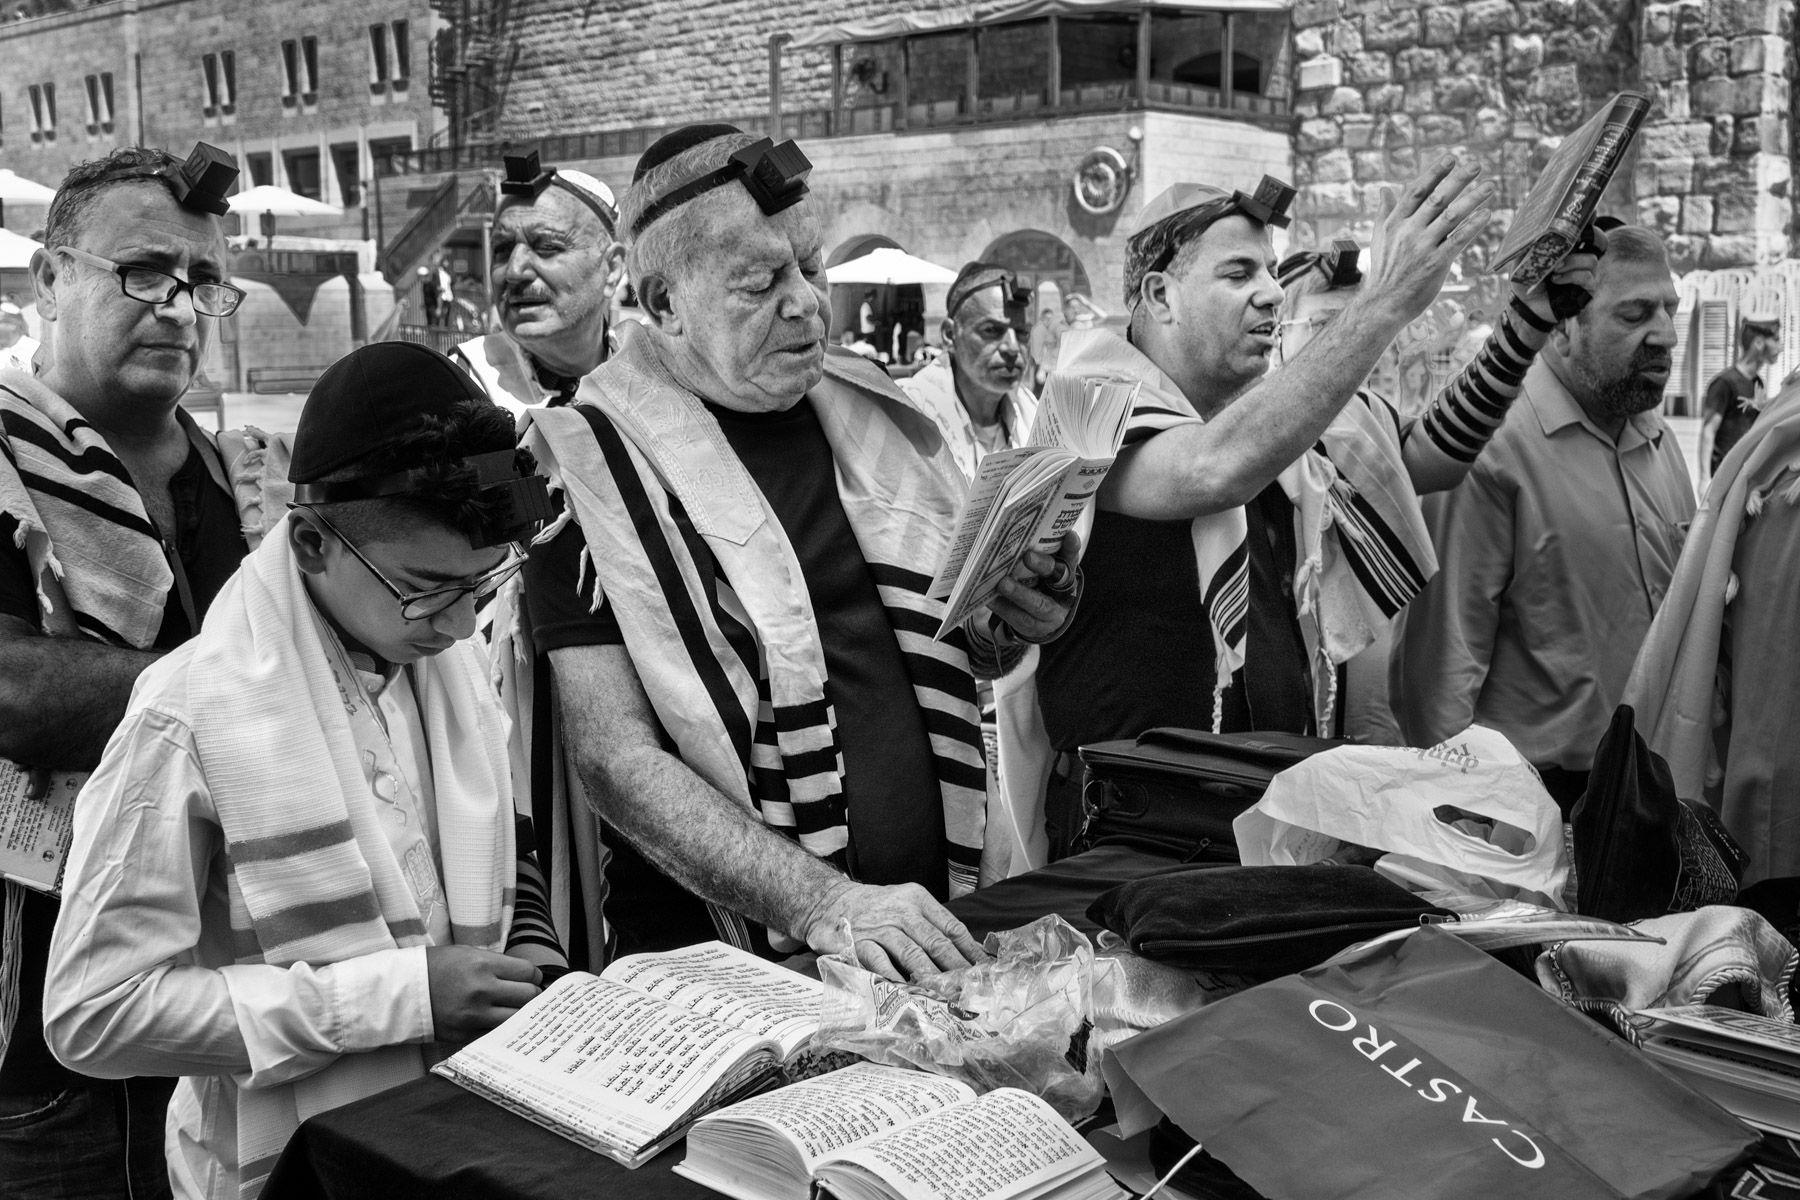 Jerusalem, Israel 06/23/16